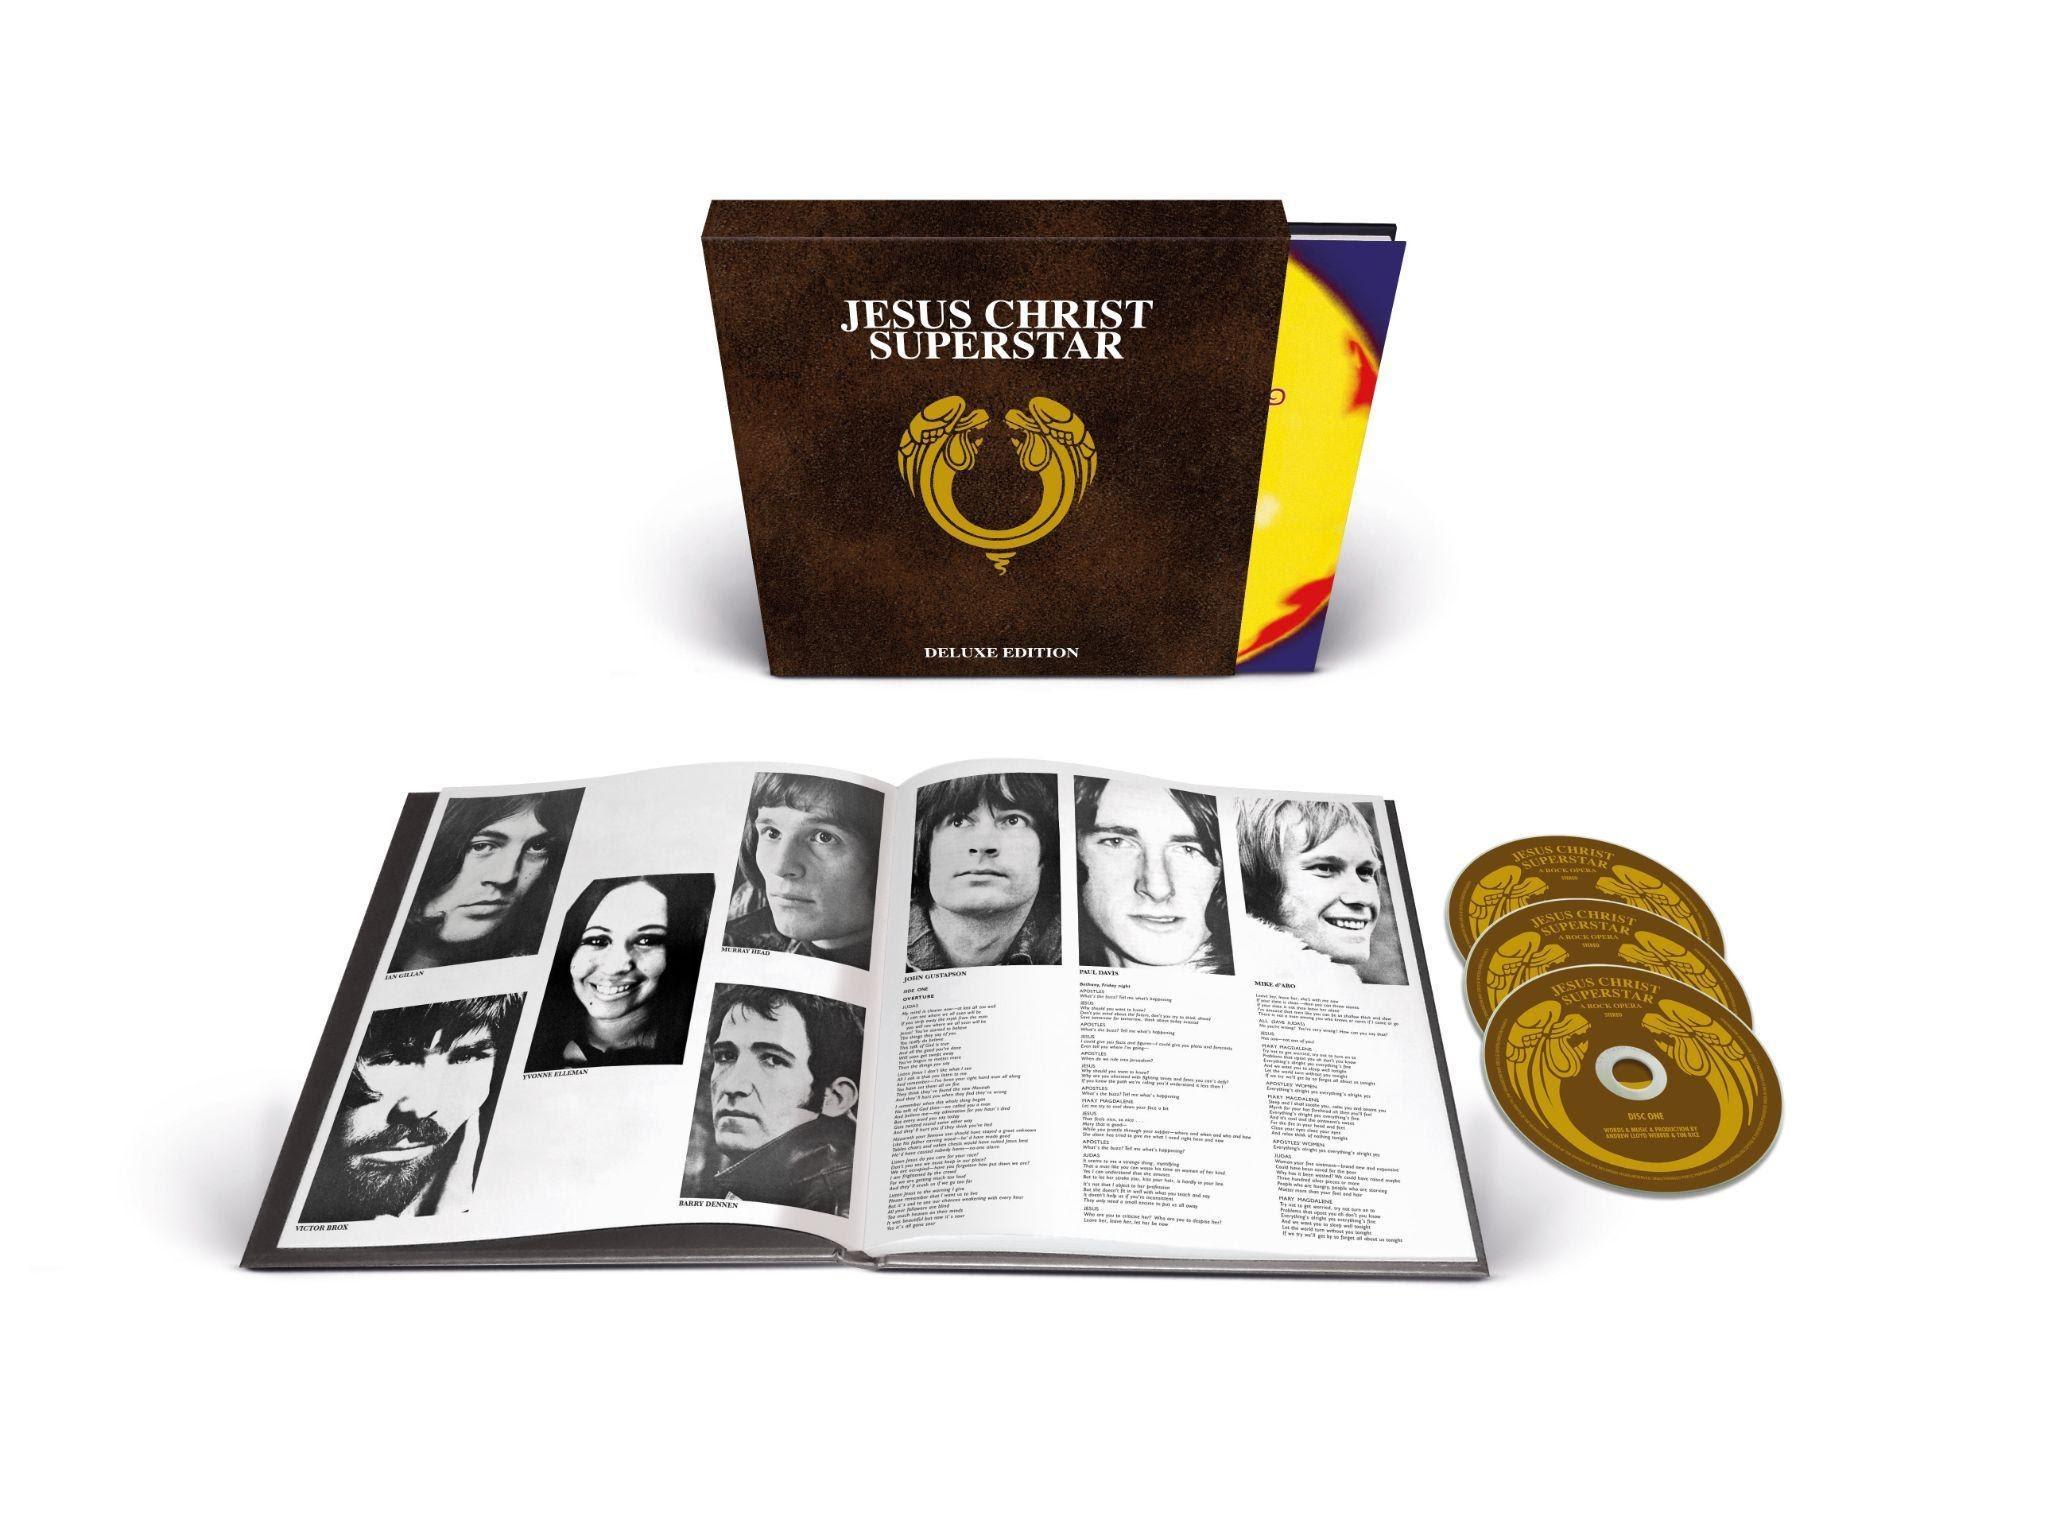 Jesus Christ Superstar, Musical Theatre, Album News, Tim Rice, Andrew Lloyd Webber